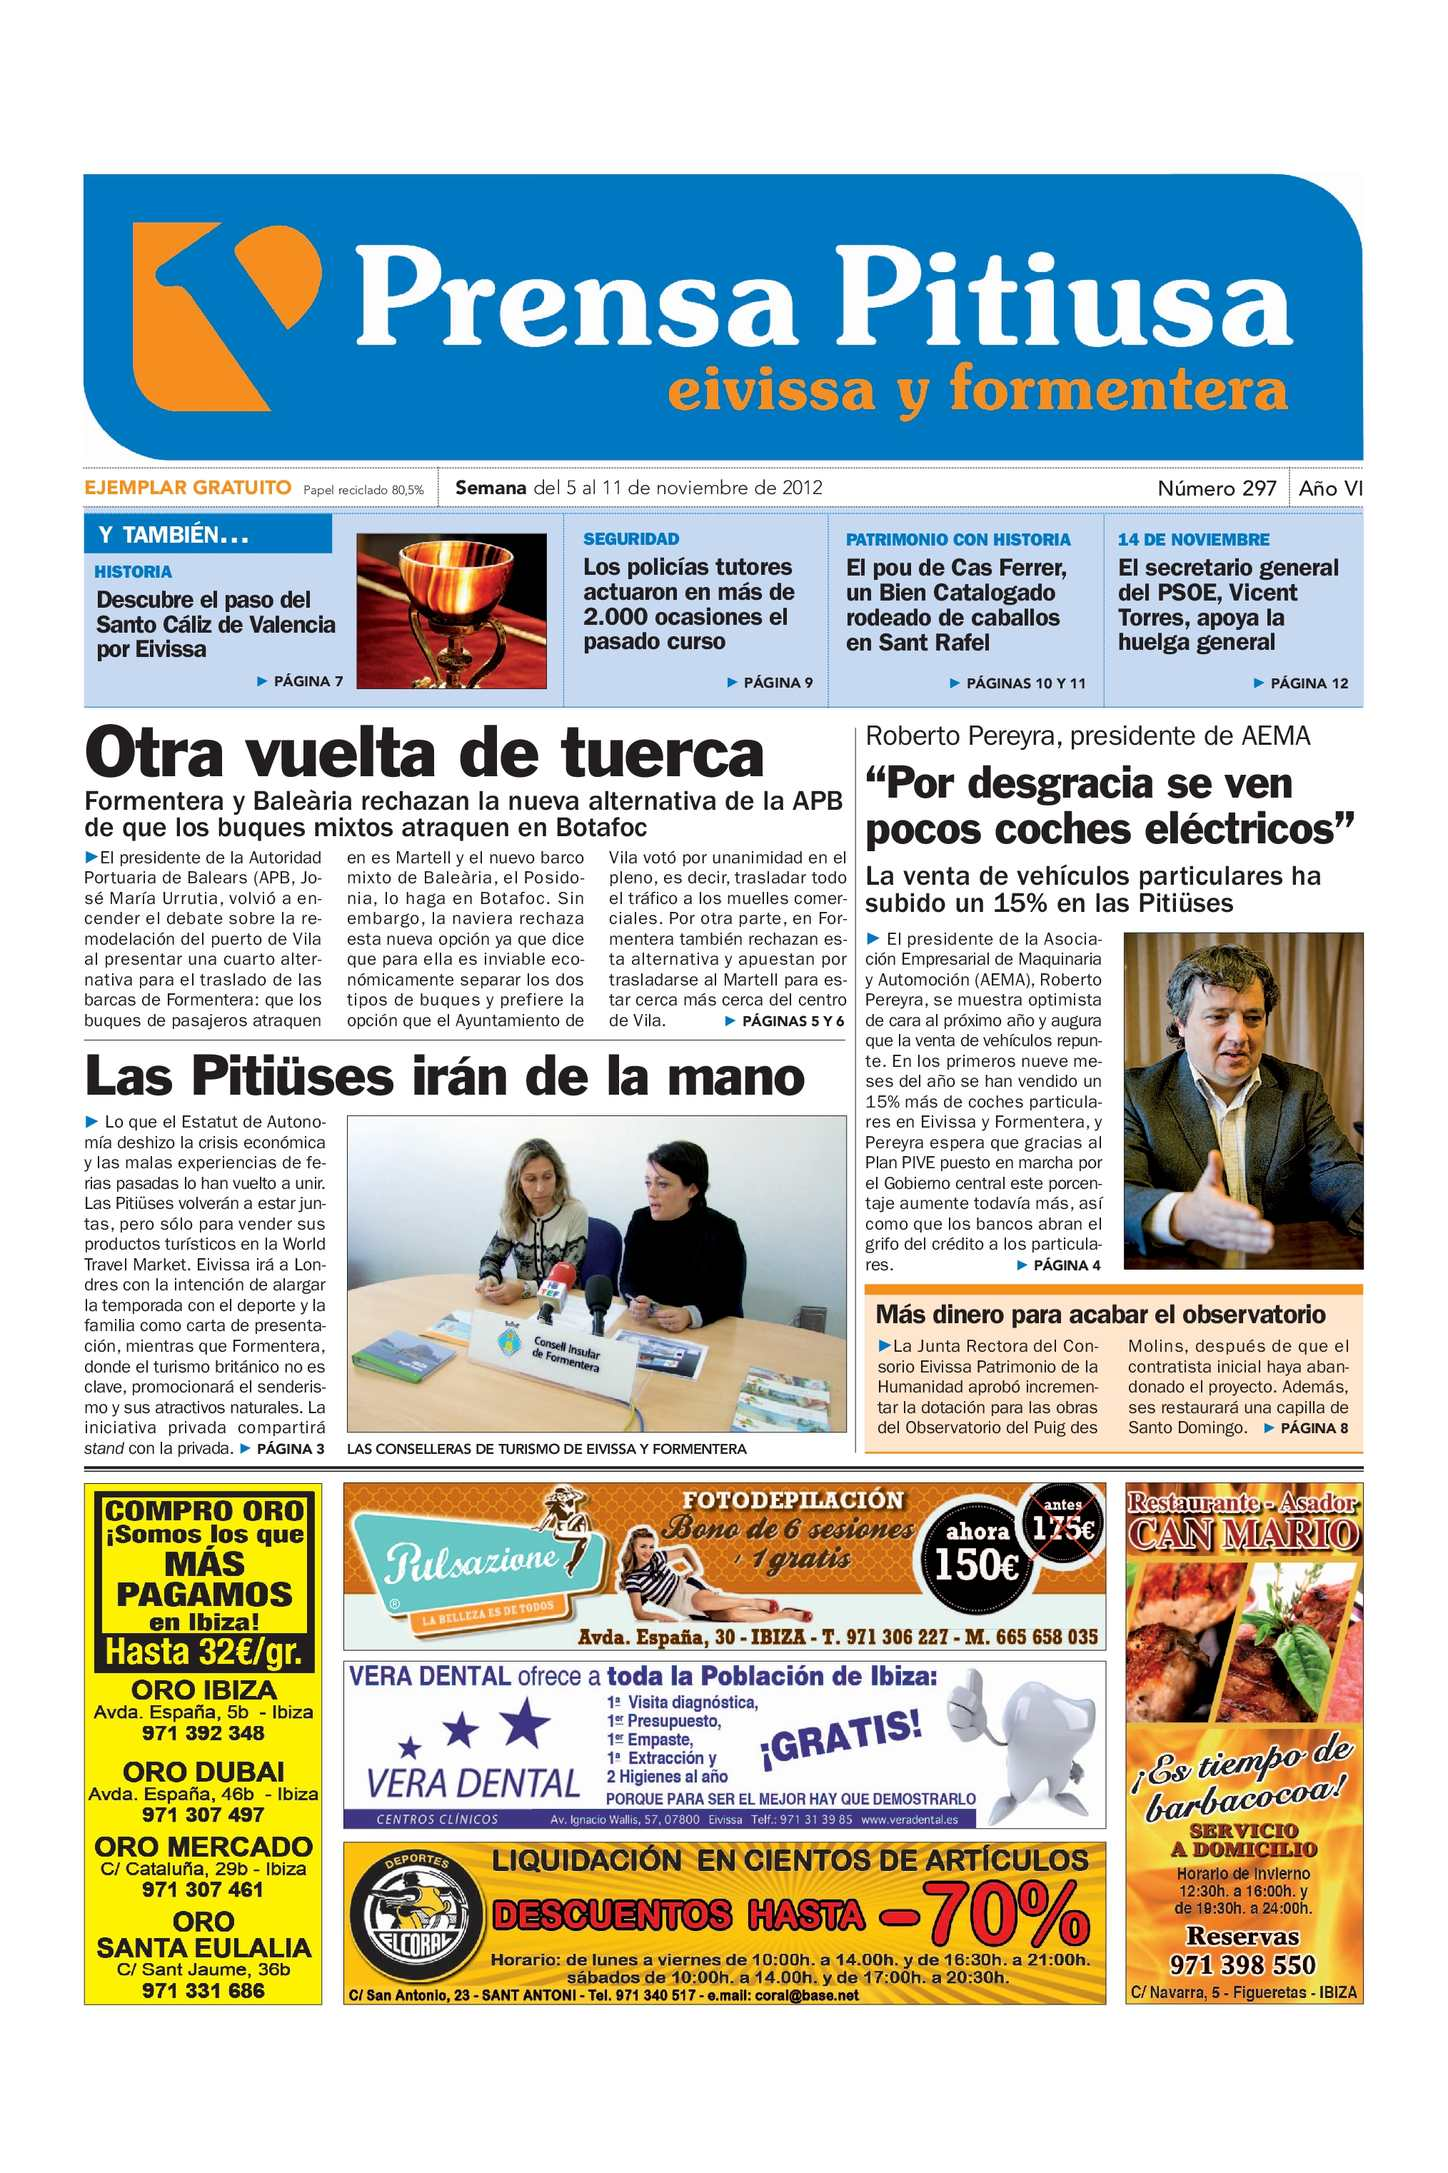 Calaméo Calaméo Pitiusa Pitiusa Prensa Calaméo 297 297 Pitiusa Prensa Prensa edición edición 5Lc4R3Ajq